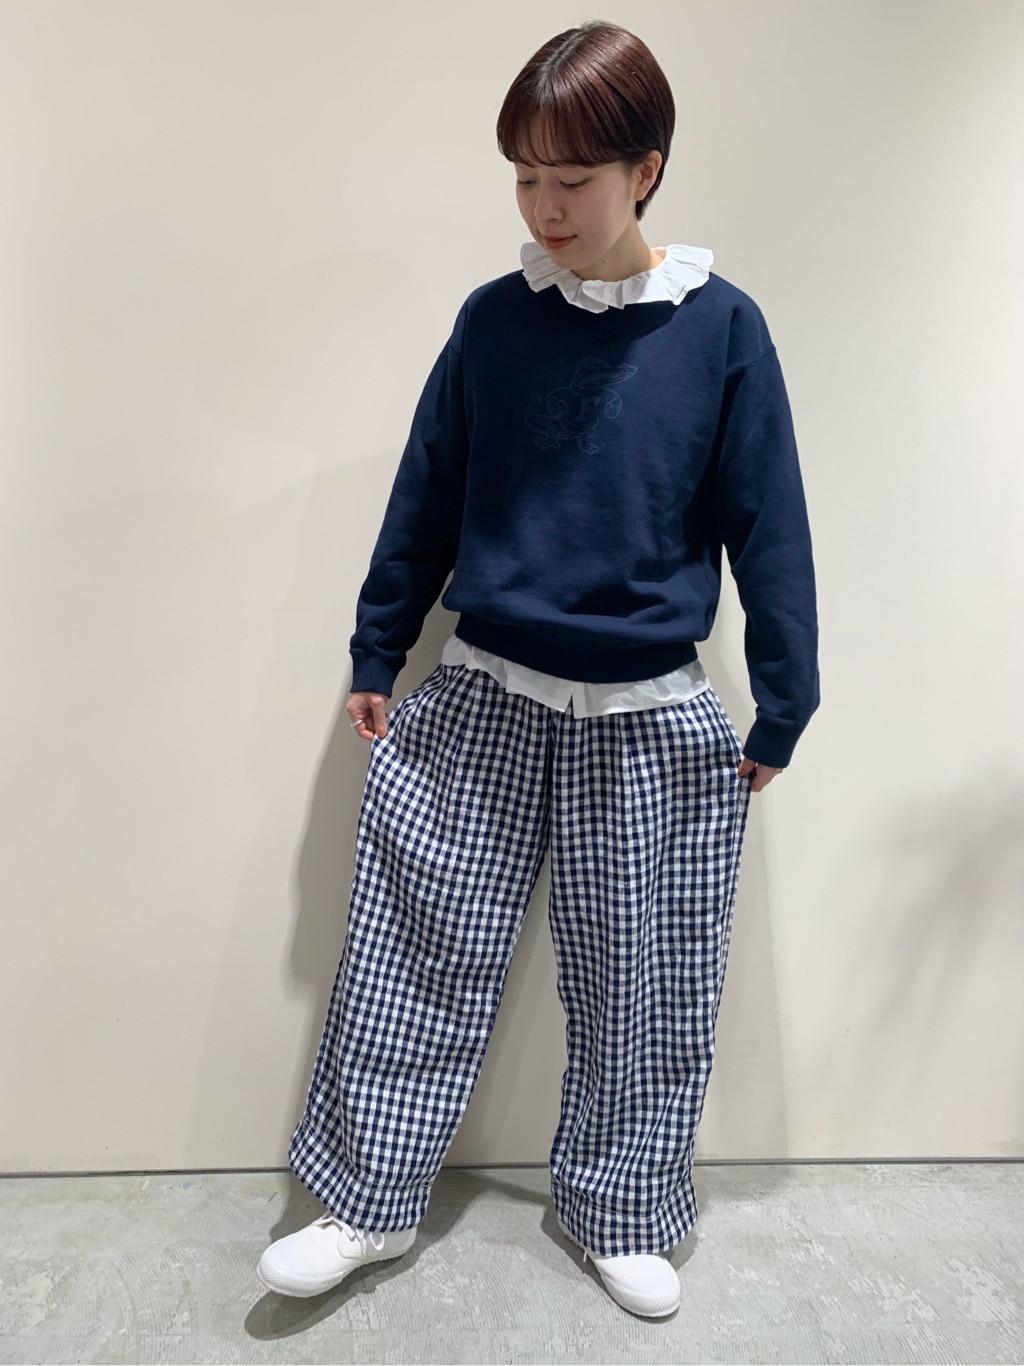 - CHILD WOMAN CHILD WOMAN , PAR ICI ルミネ横浜 身長:158cm 2021.02.05